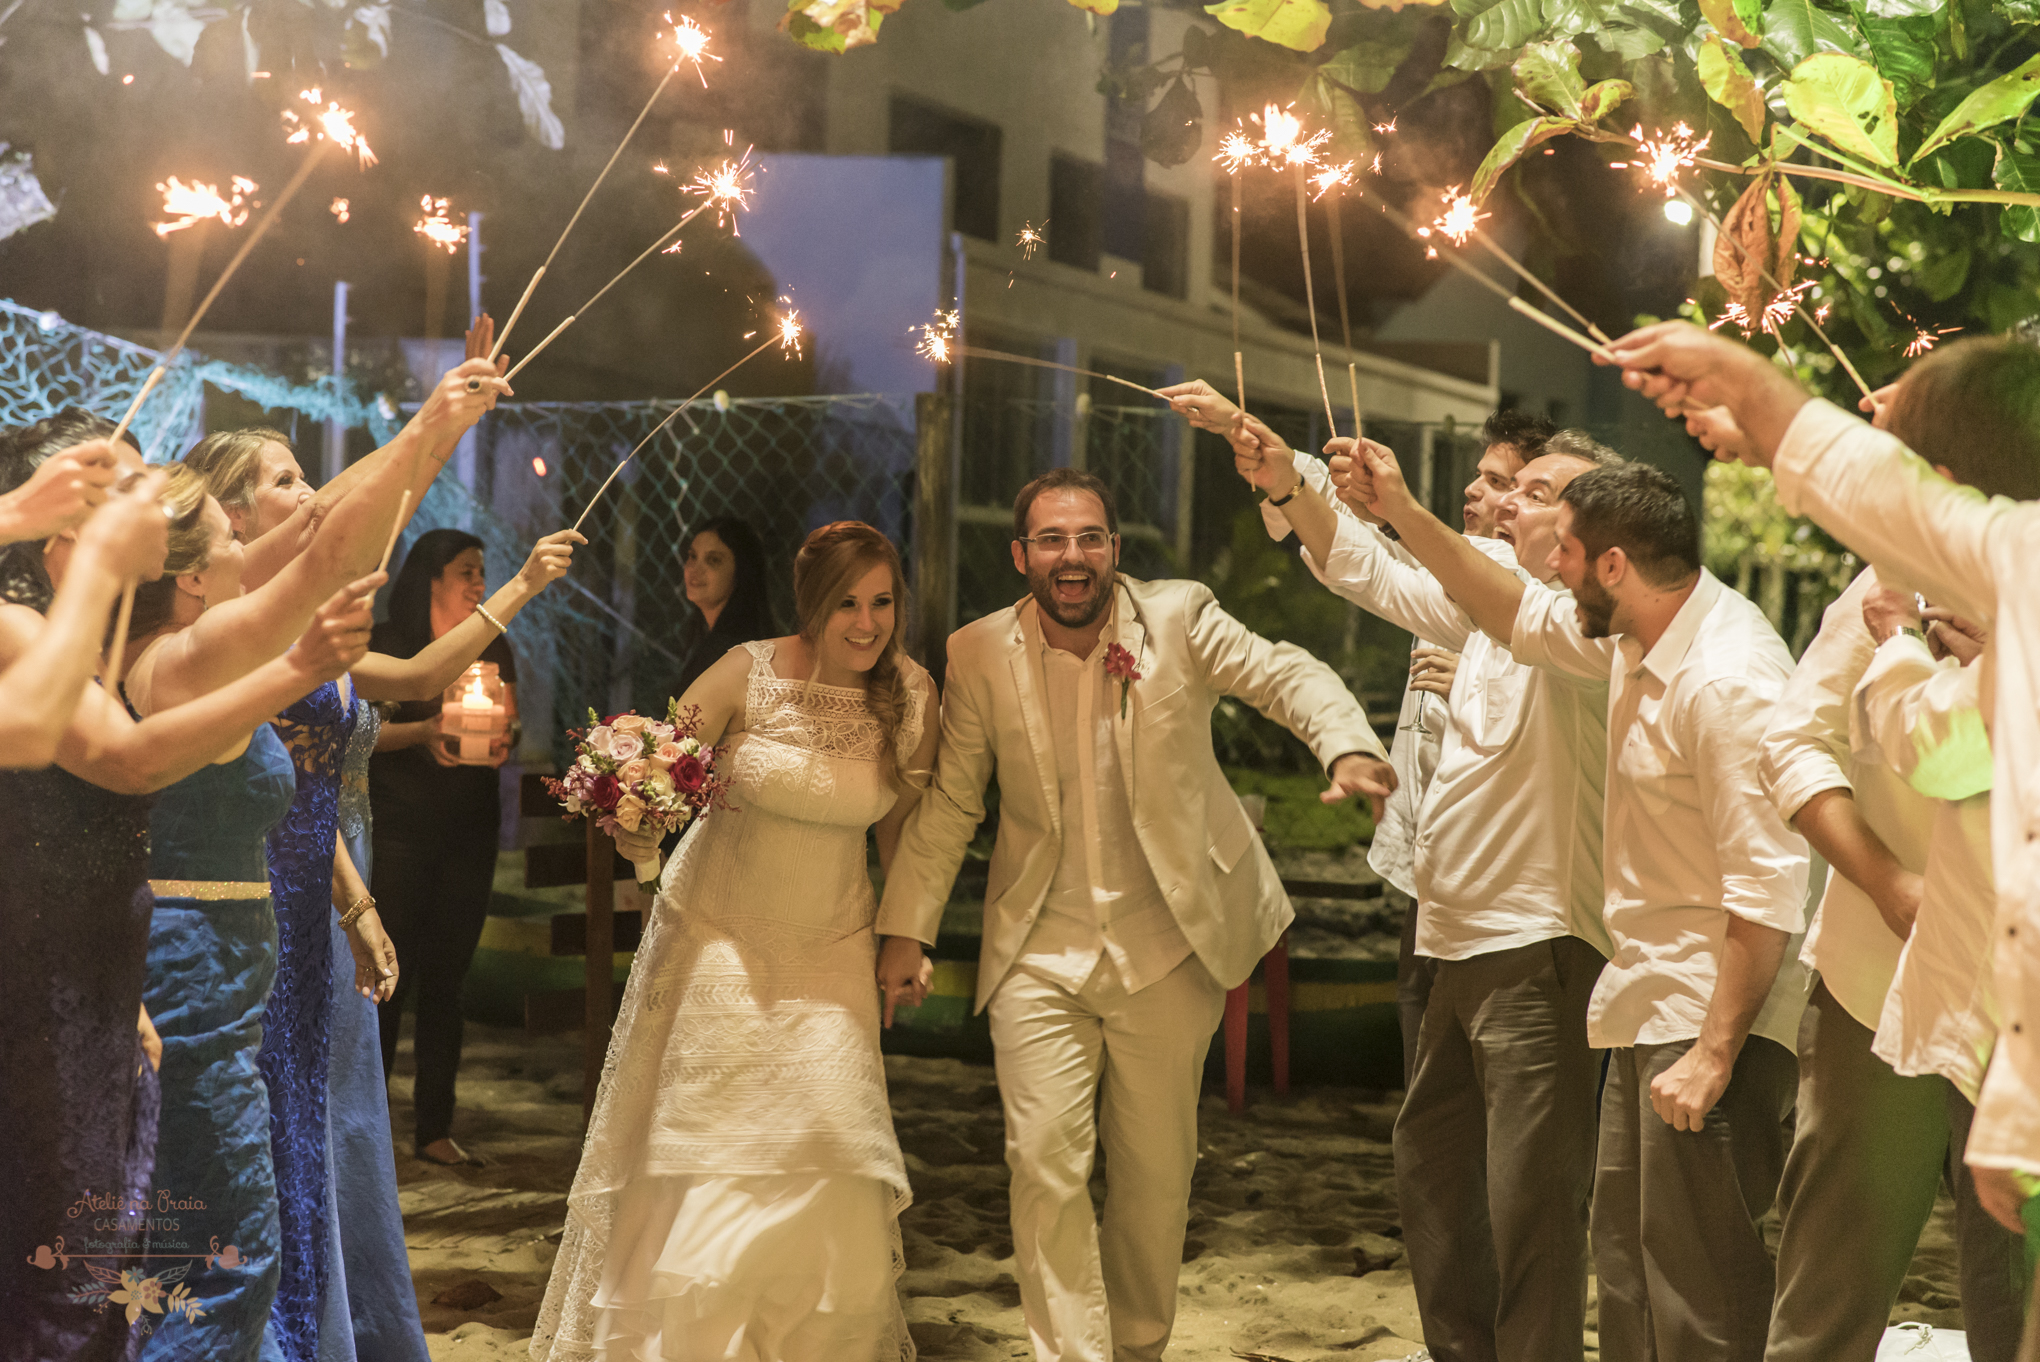 08-Festa-Atelie-na-Praia-Casamento-na-Praia-Erica-Daniel-9286